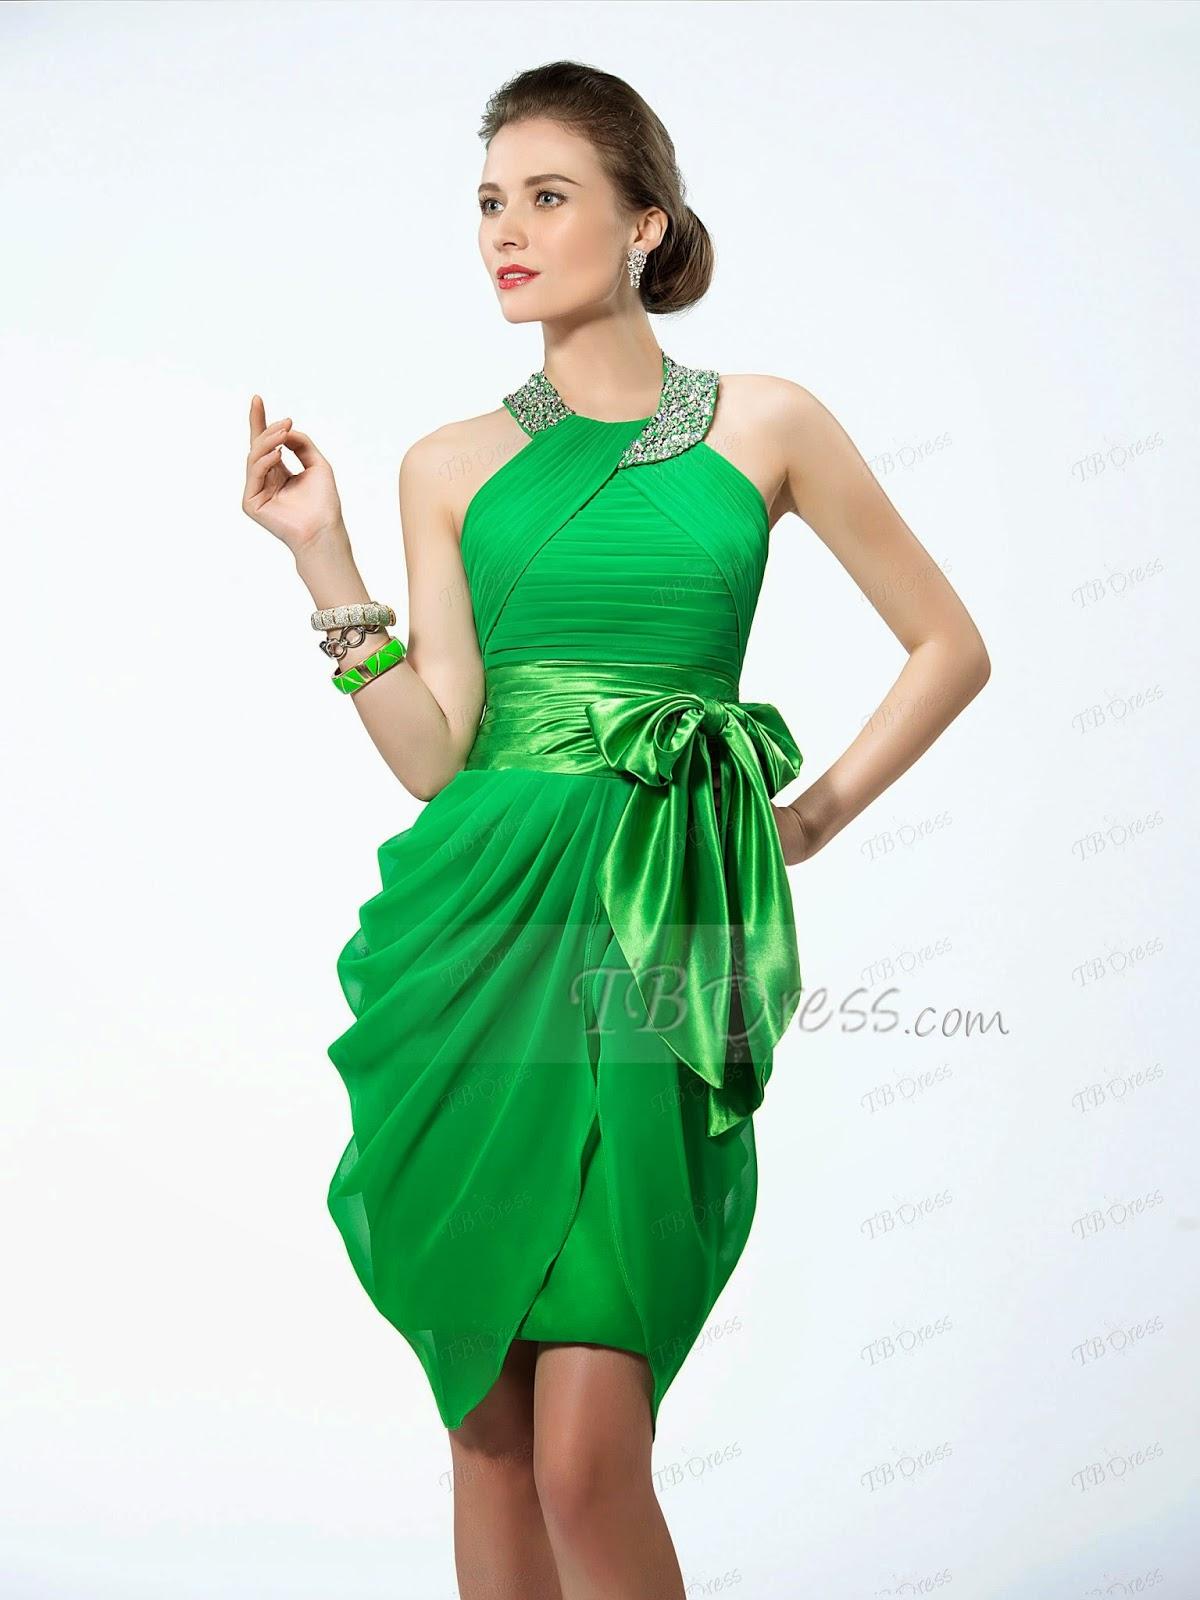 Halter Neckline Studded Belt Bowknot Short Cocktail Dress